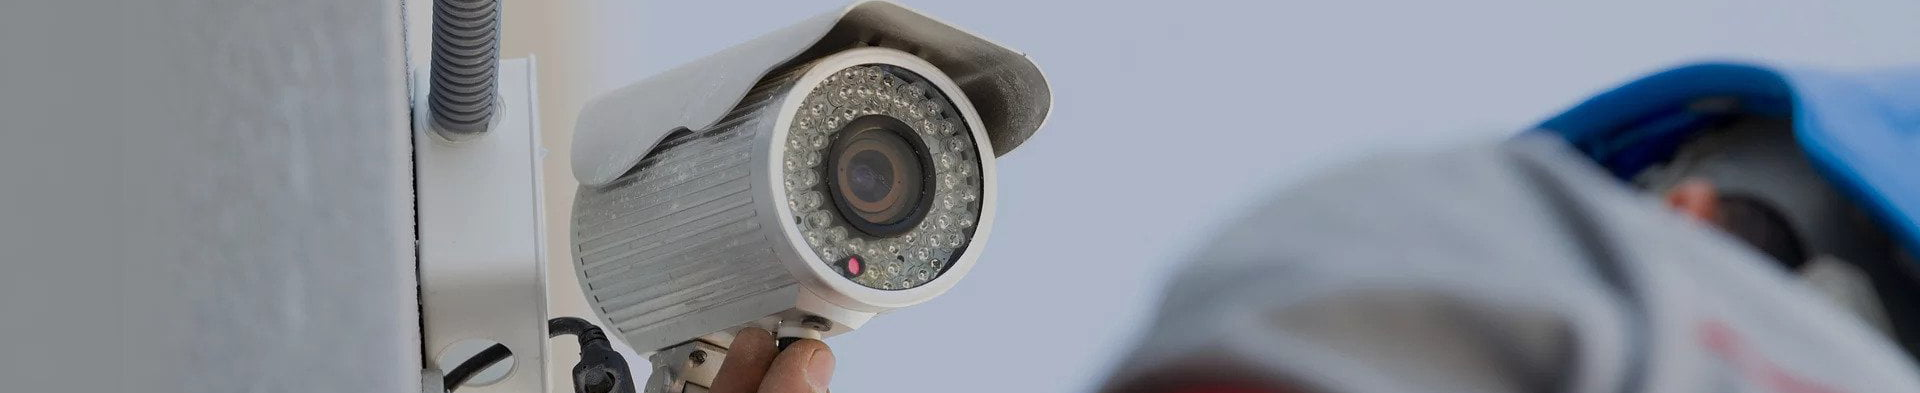 Security Camera, CCTV, Surveillance System Installers